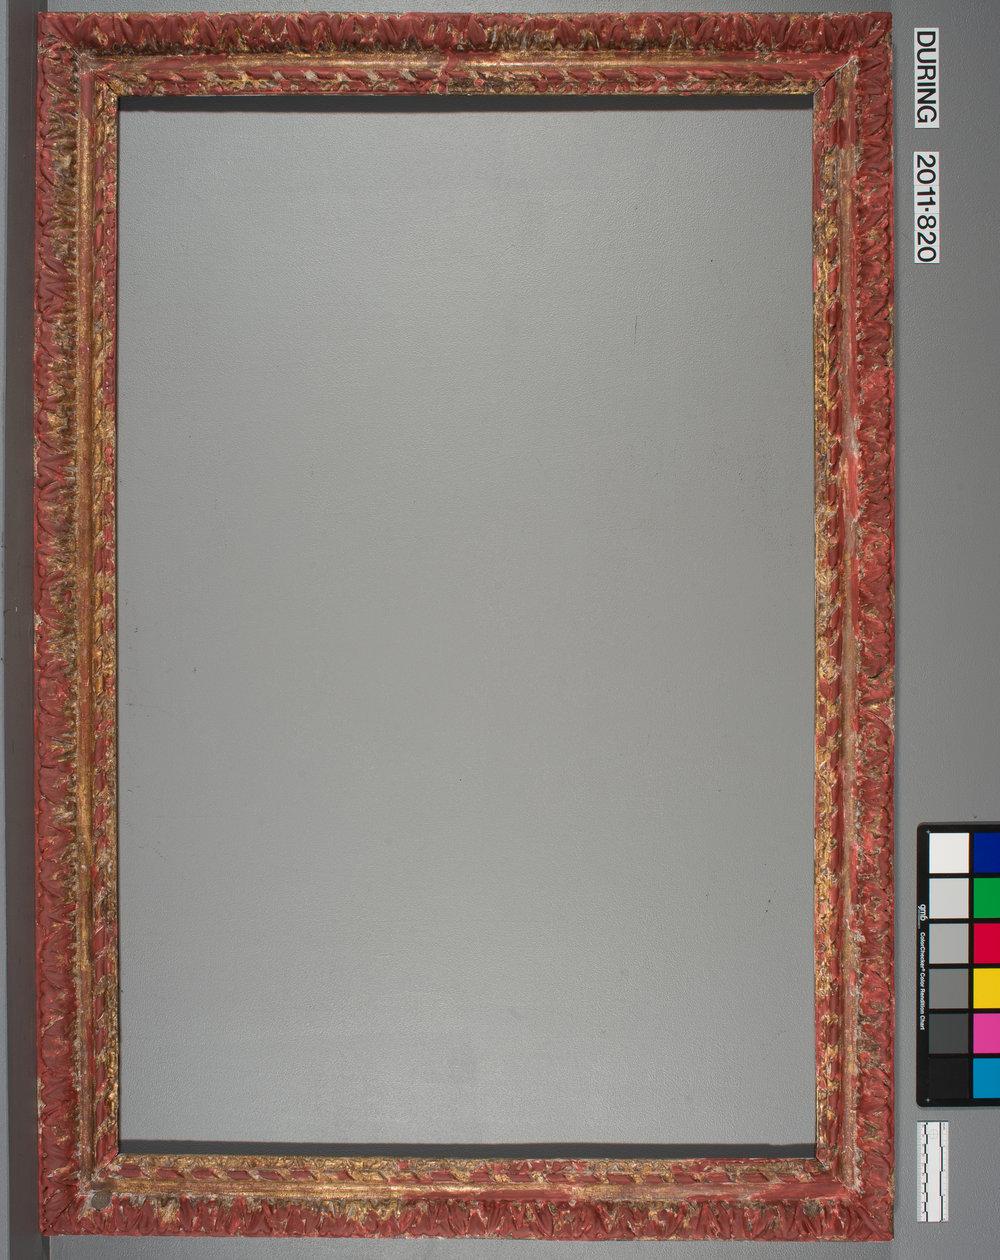 carved_baroque_frame-02-DT-red-bole